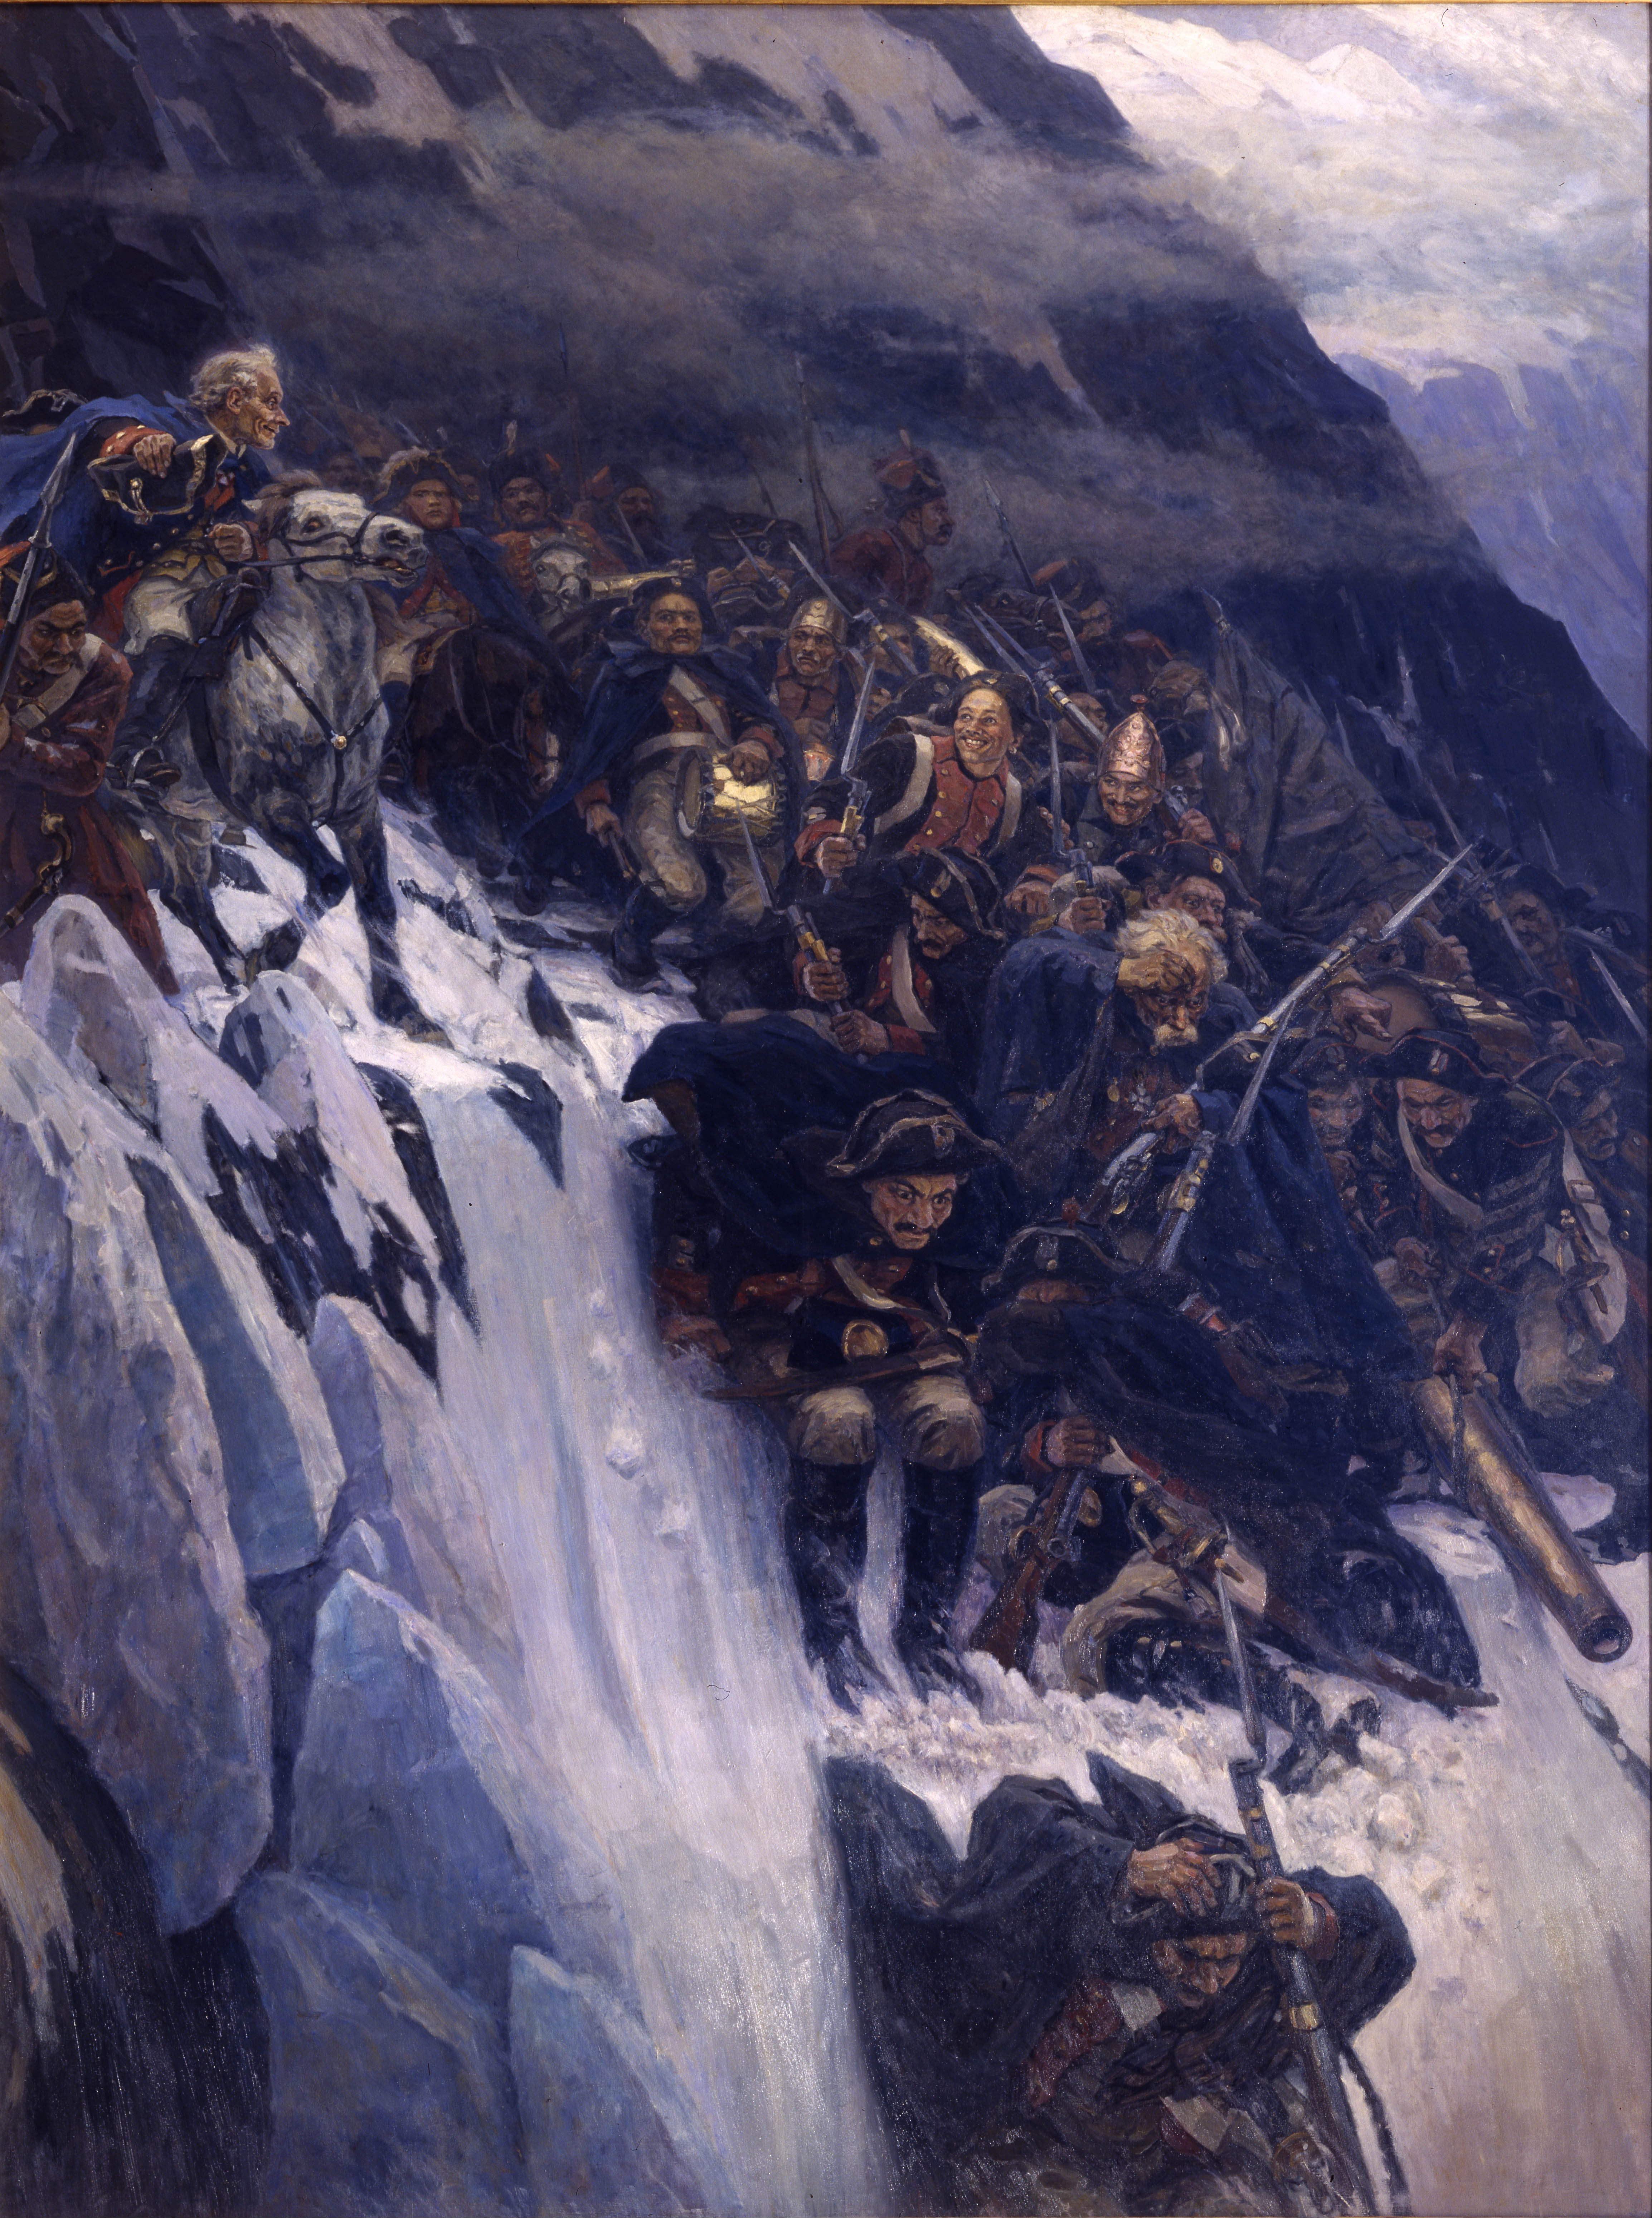 Vasily Surikov Vasily_Surikov_-_Suvorov_Crossing_the_Alps_in_1799_-_Google_Art_Project